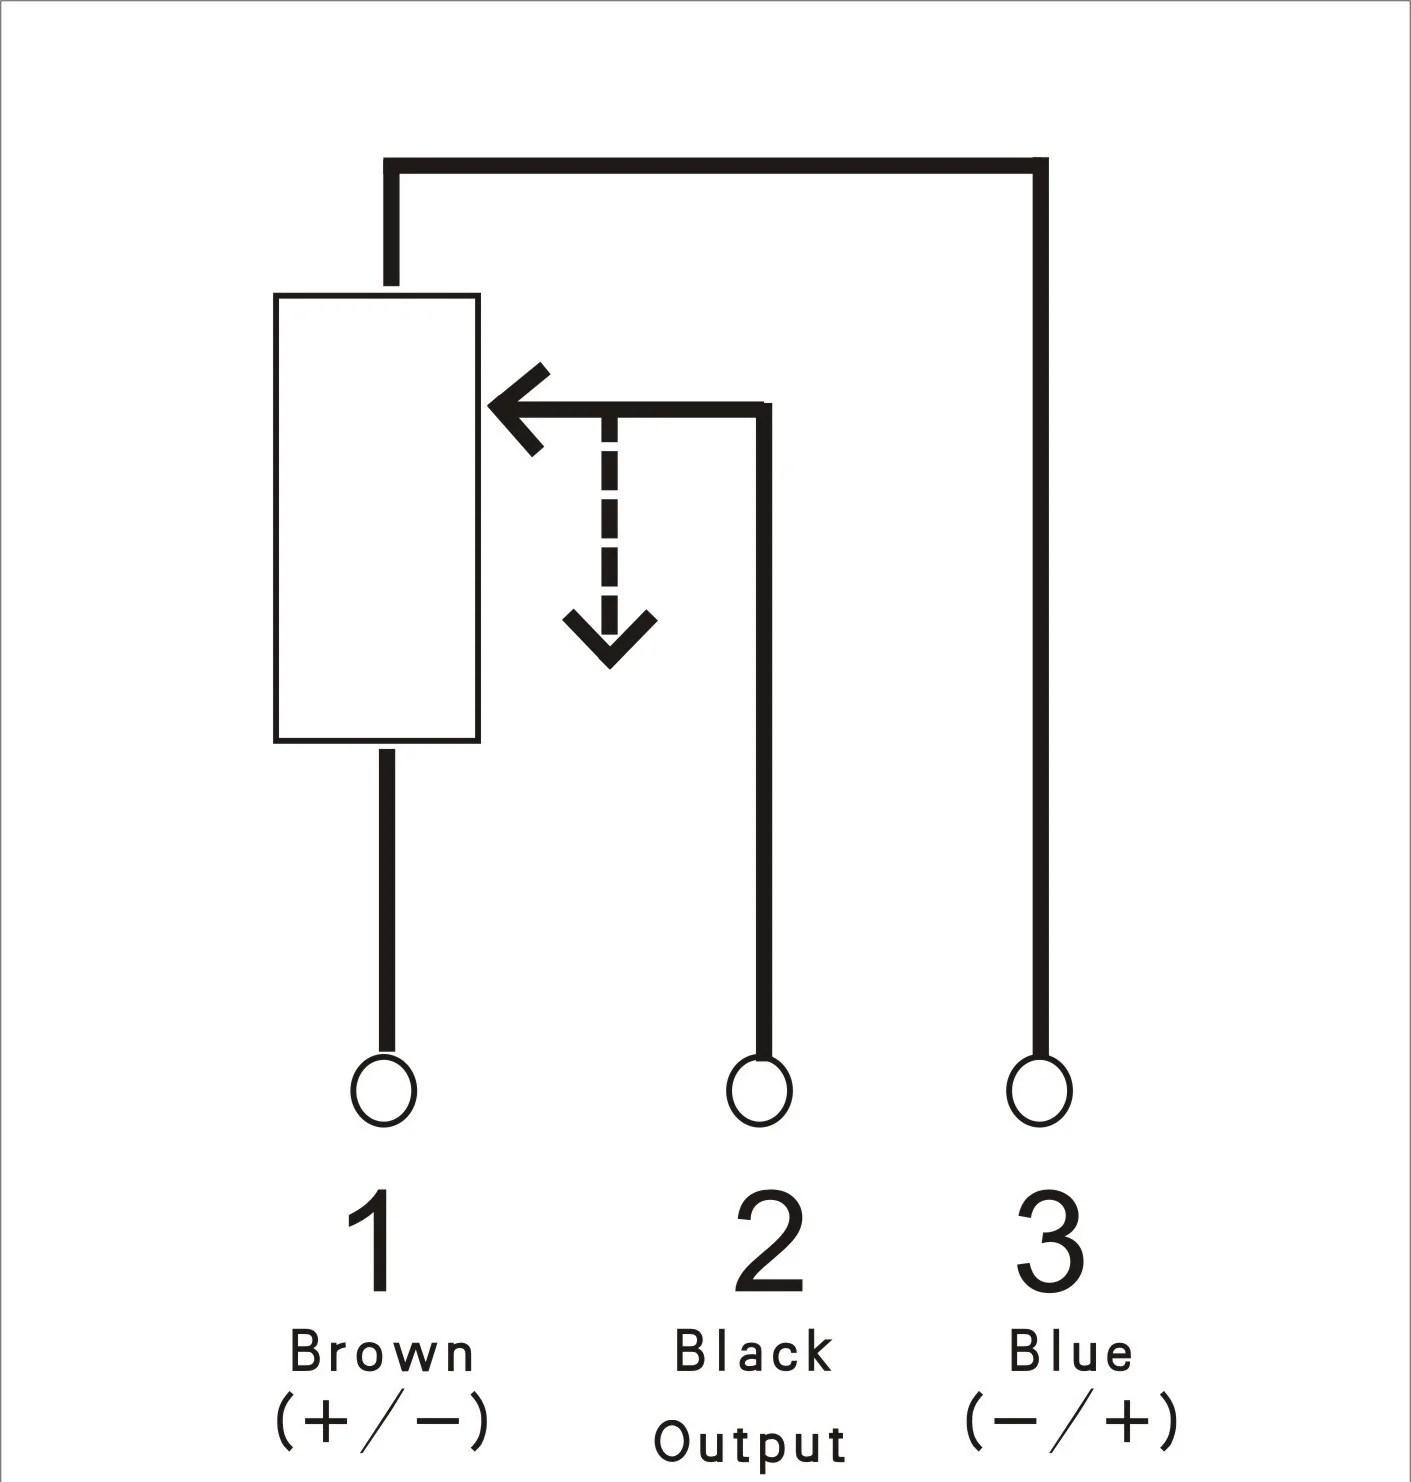 hight resolution of potentiometer wiring diagram wiring diagrams lol for a 10k potentiometer wiring diagrams little wiring diagrams joystick